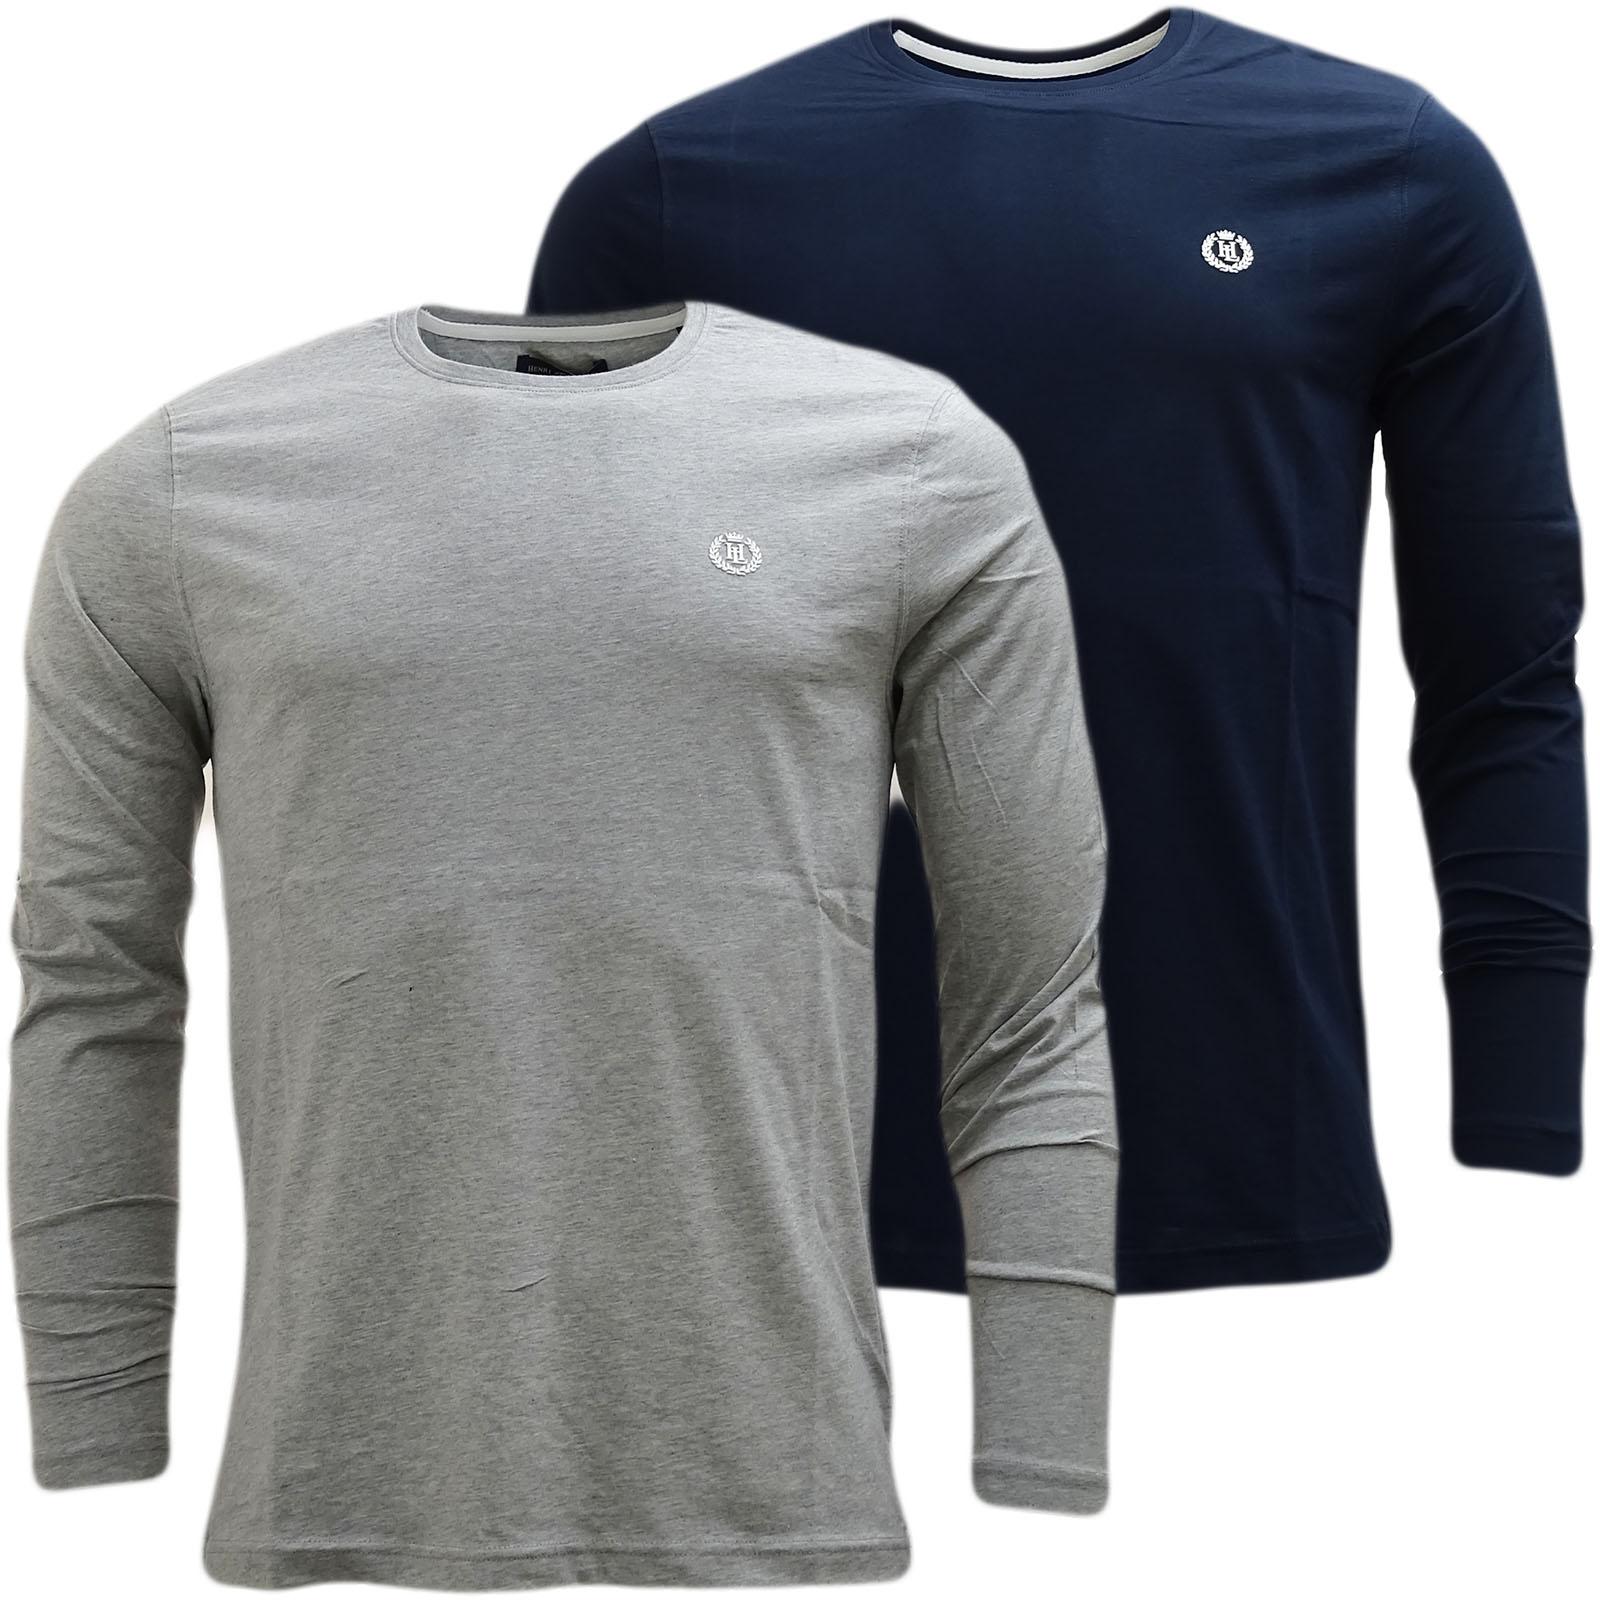 Henri Lloyd Plain Long Sleeve Long Sleeve T-Shirt Radar Long